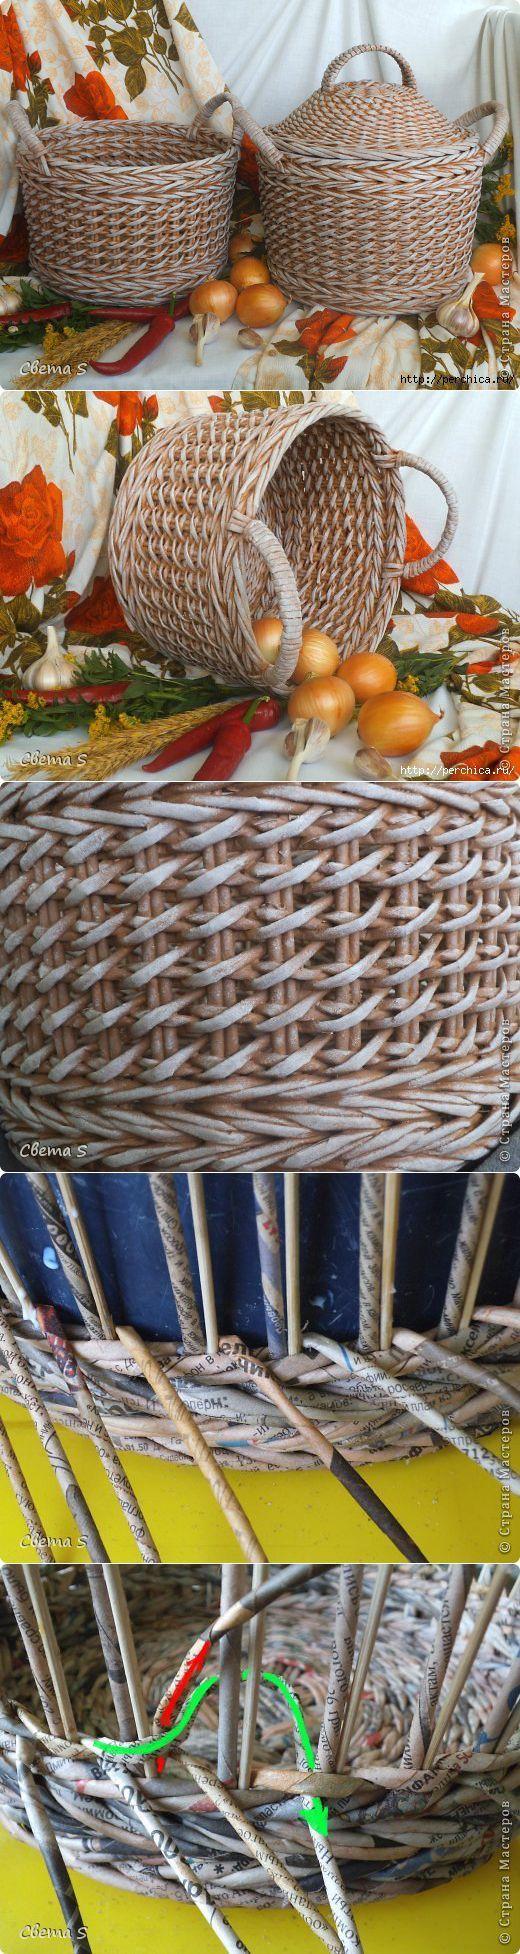 Weaving baskets from plastic bottles: master class 31